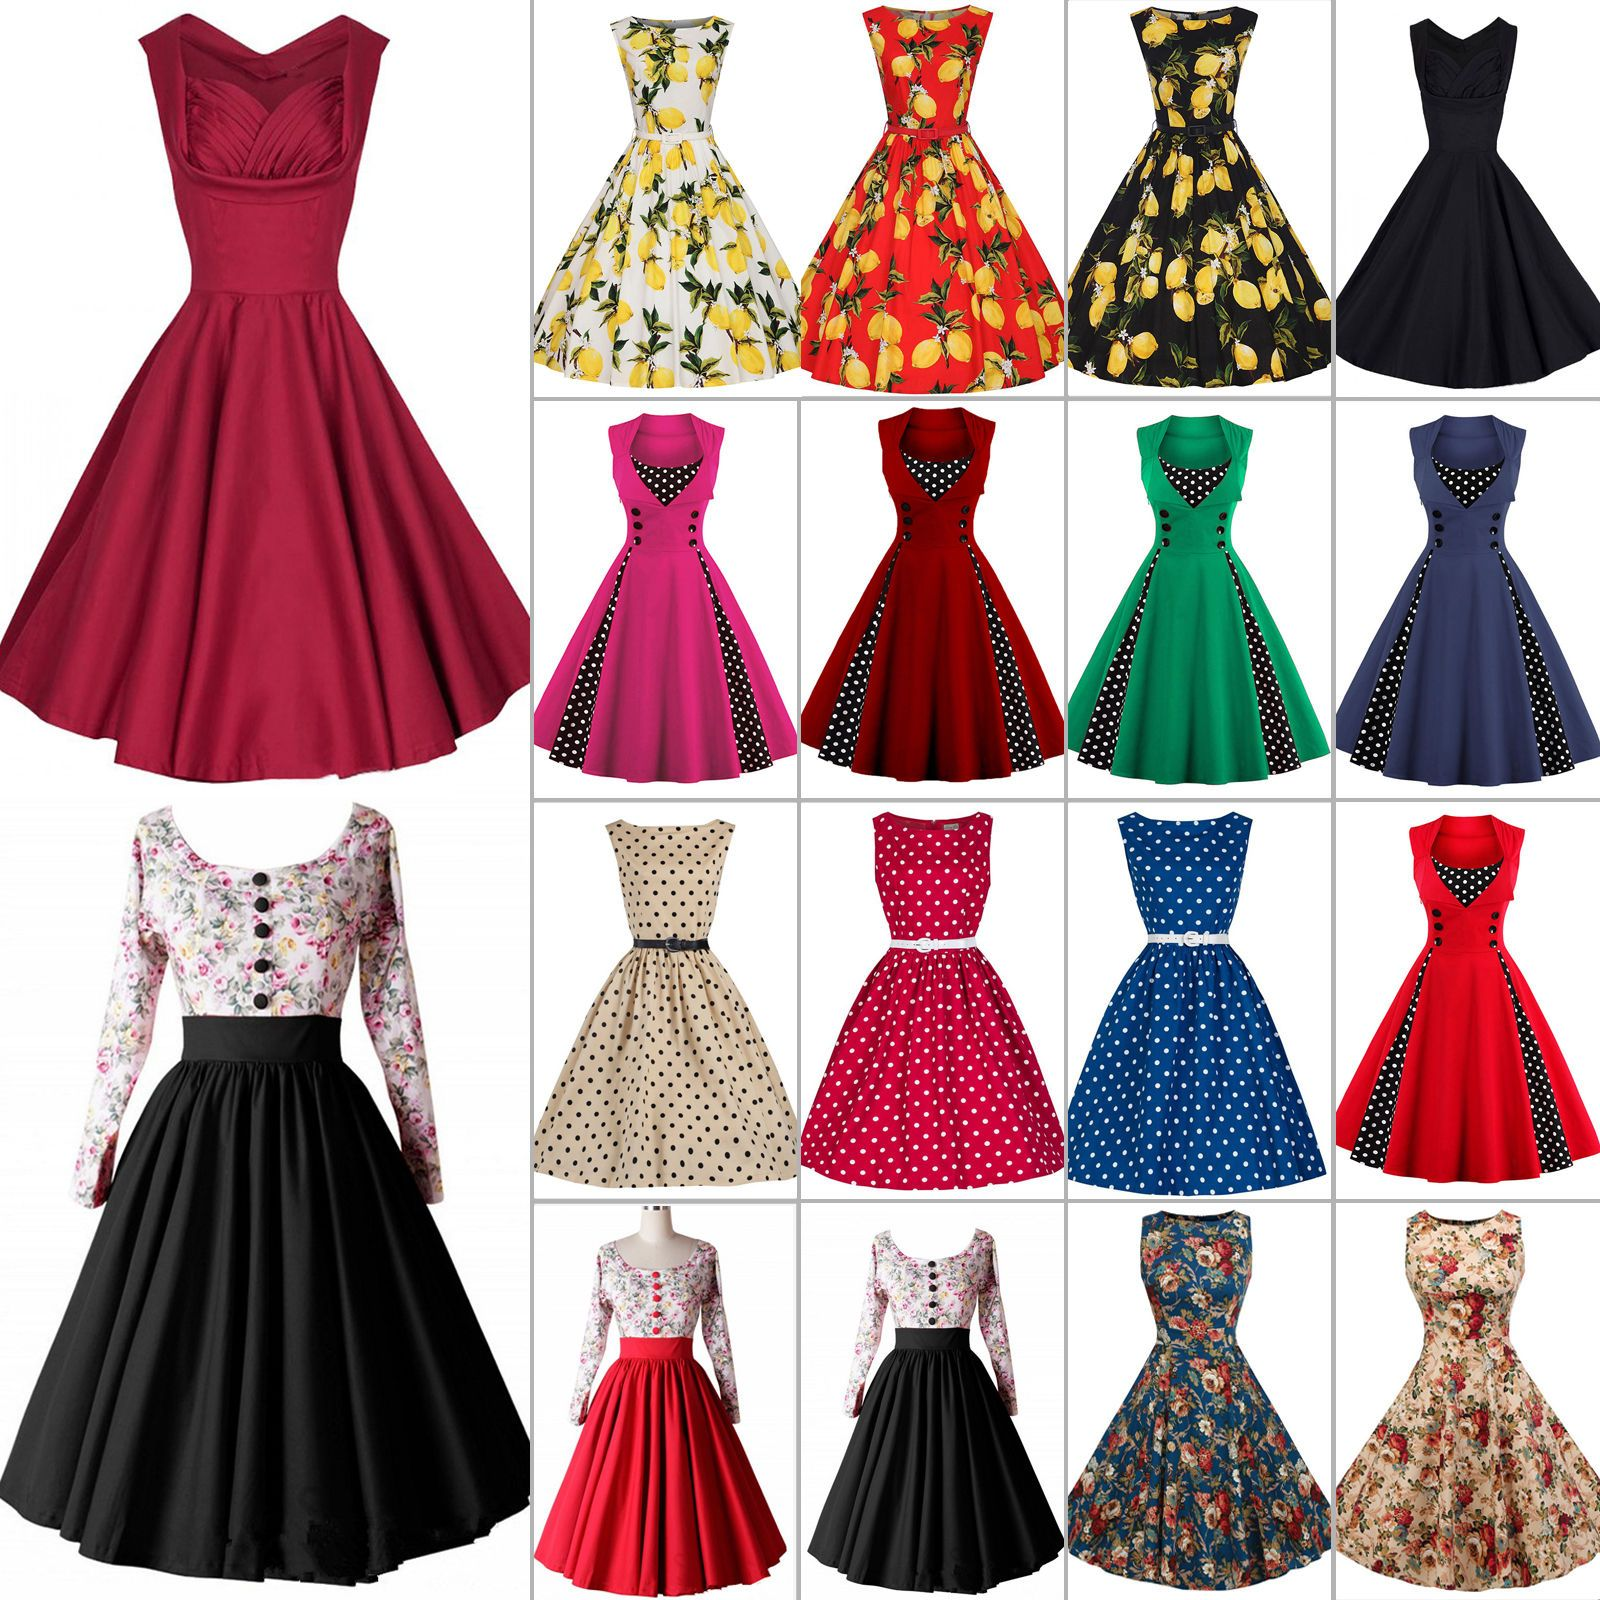 Damen Rockabilly Retro Swing Petticoat Hepburn Partykleider